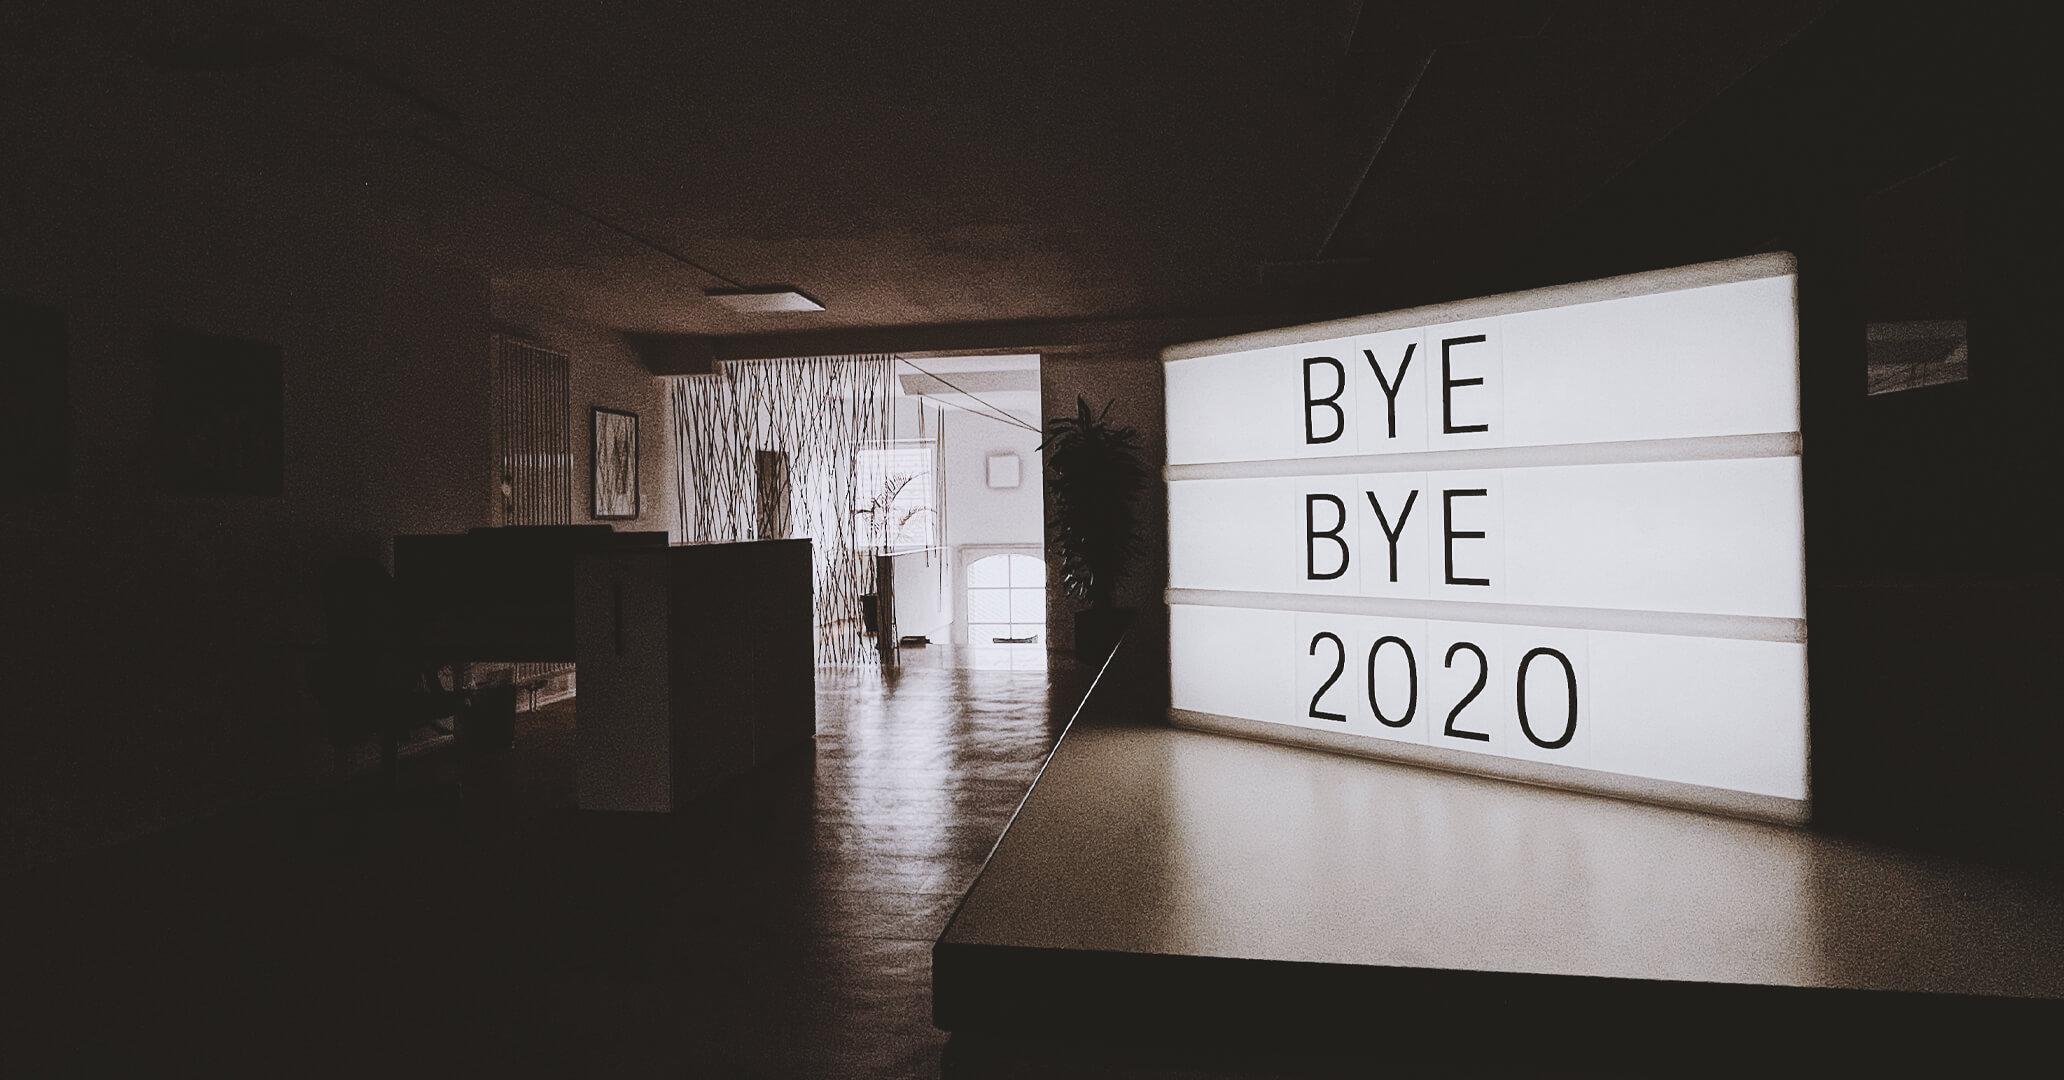 teamElgato News – Bye Bye 2020